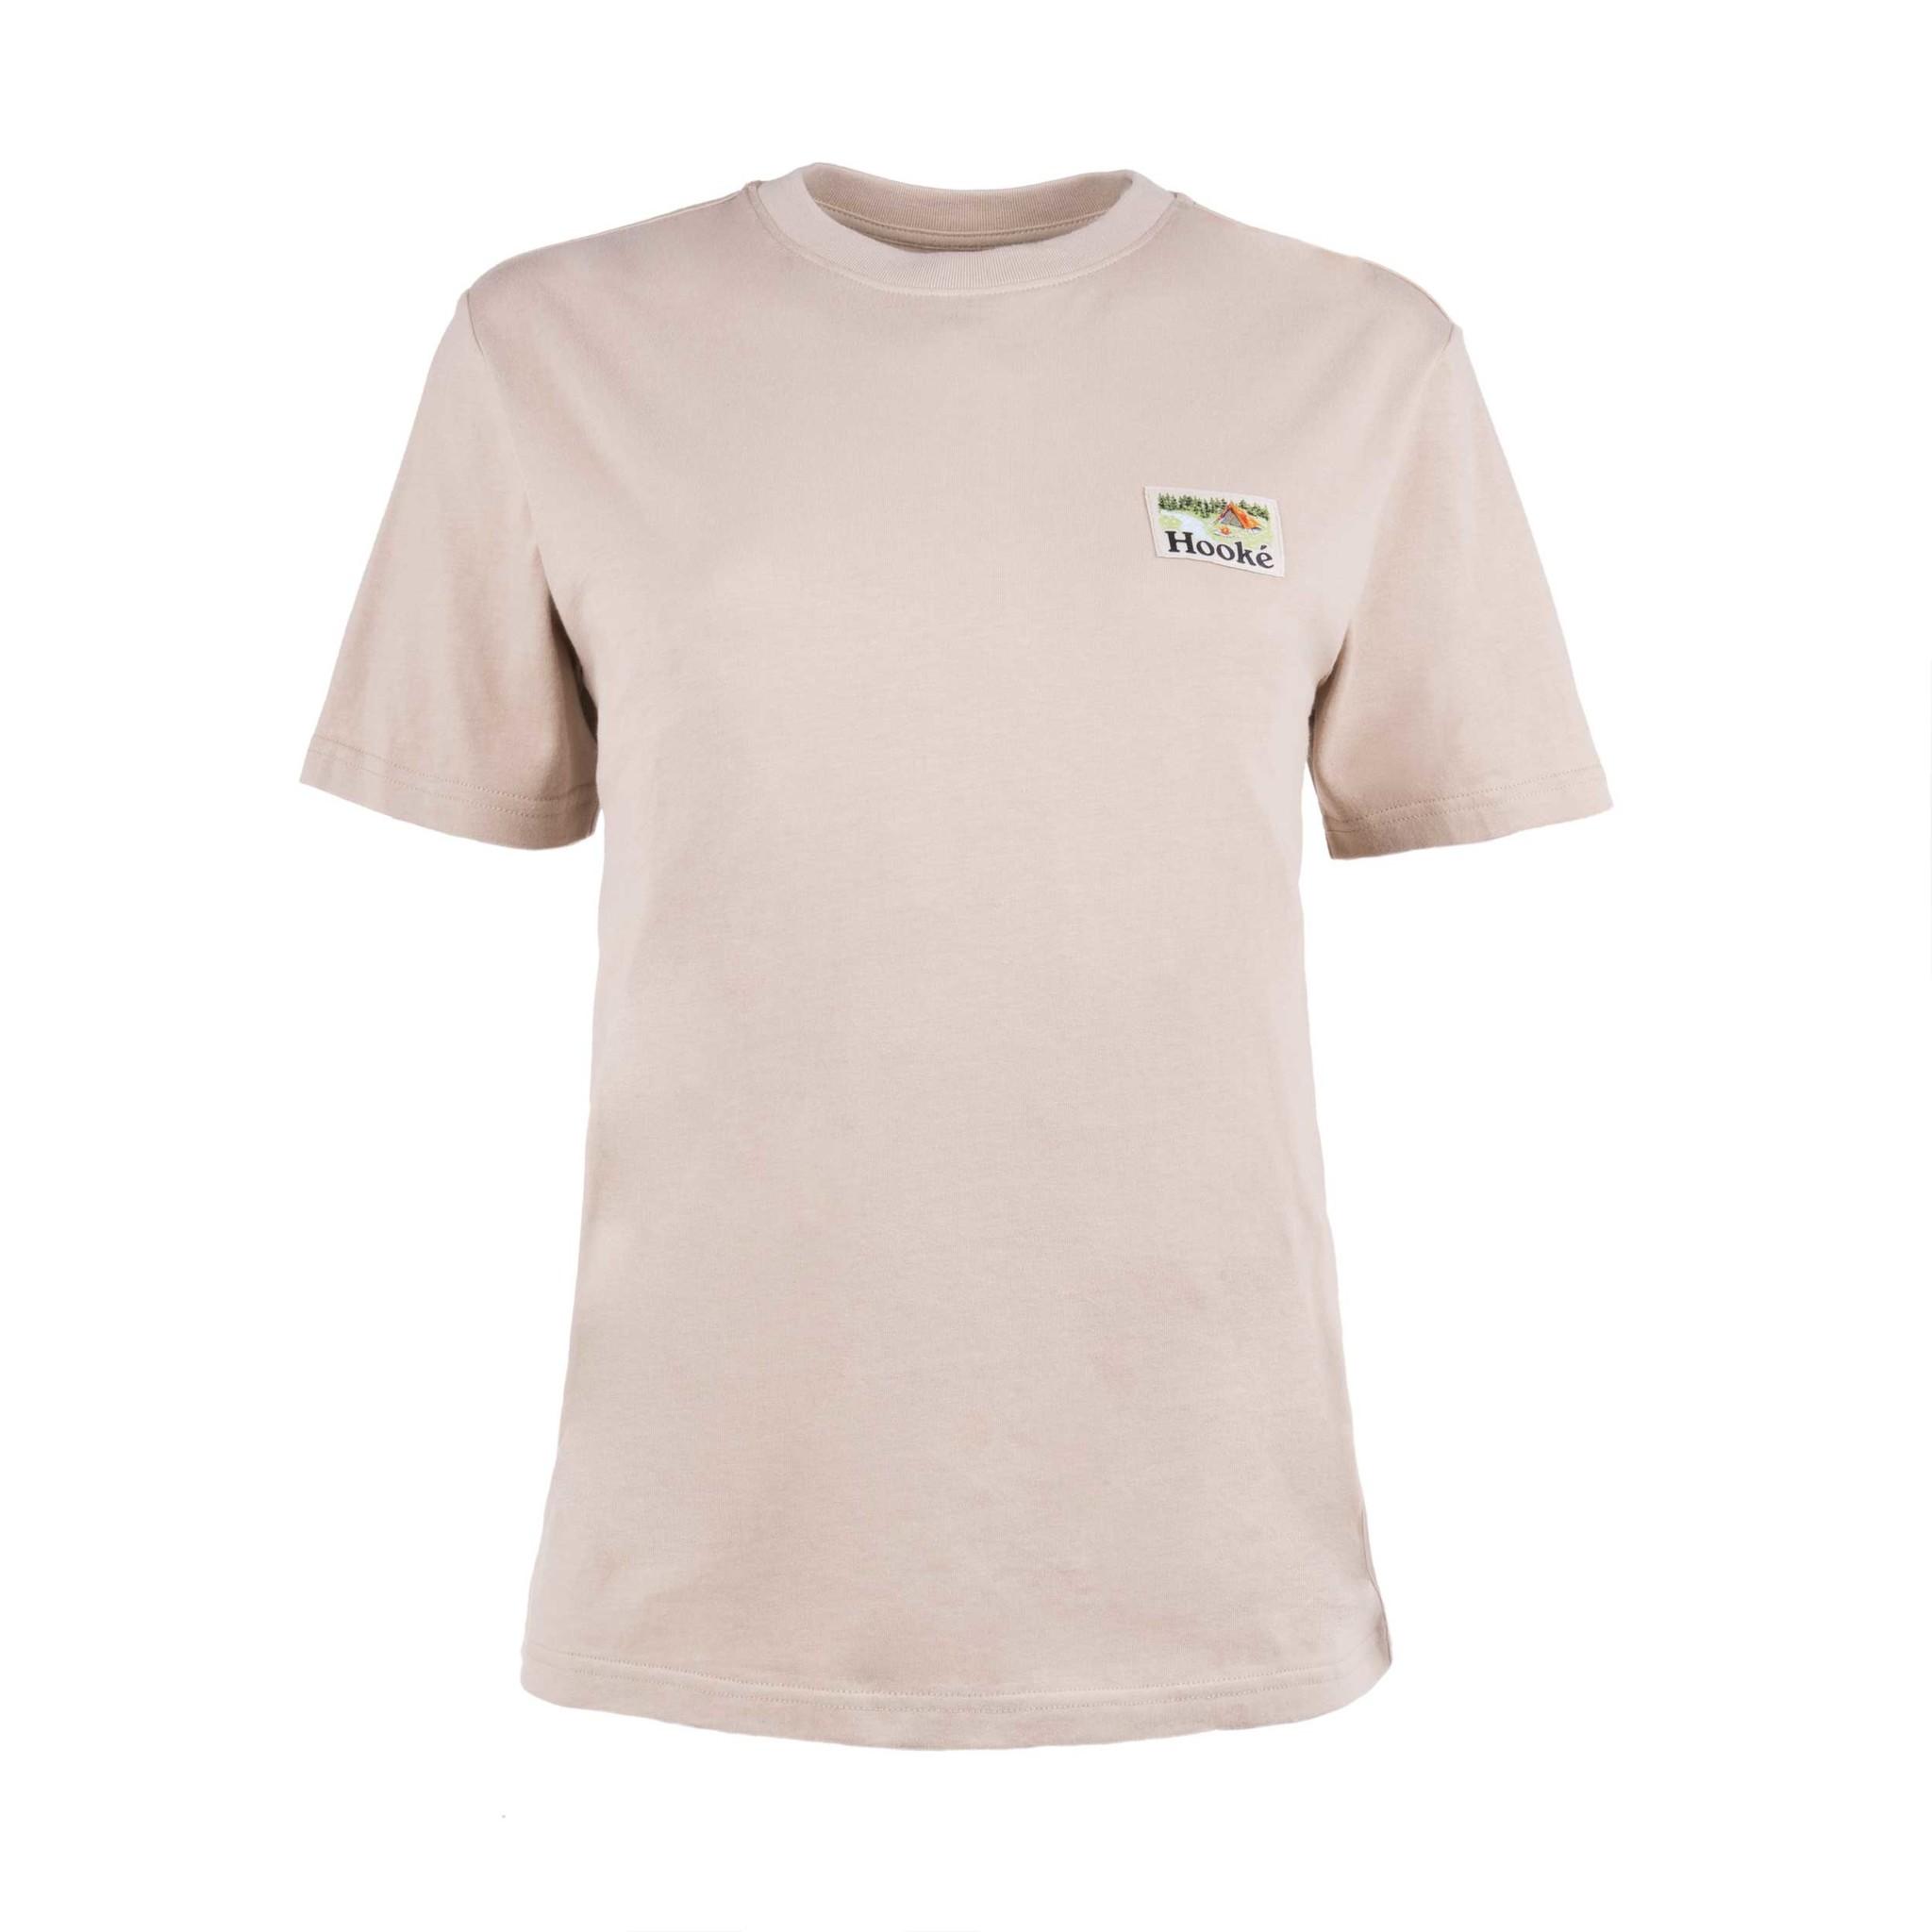 Women's Camping T-Shirt Safari pour femme